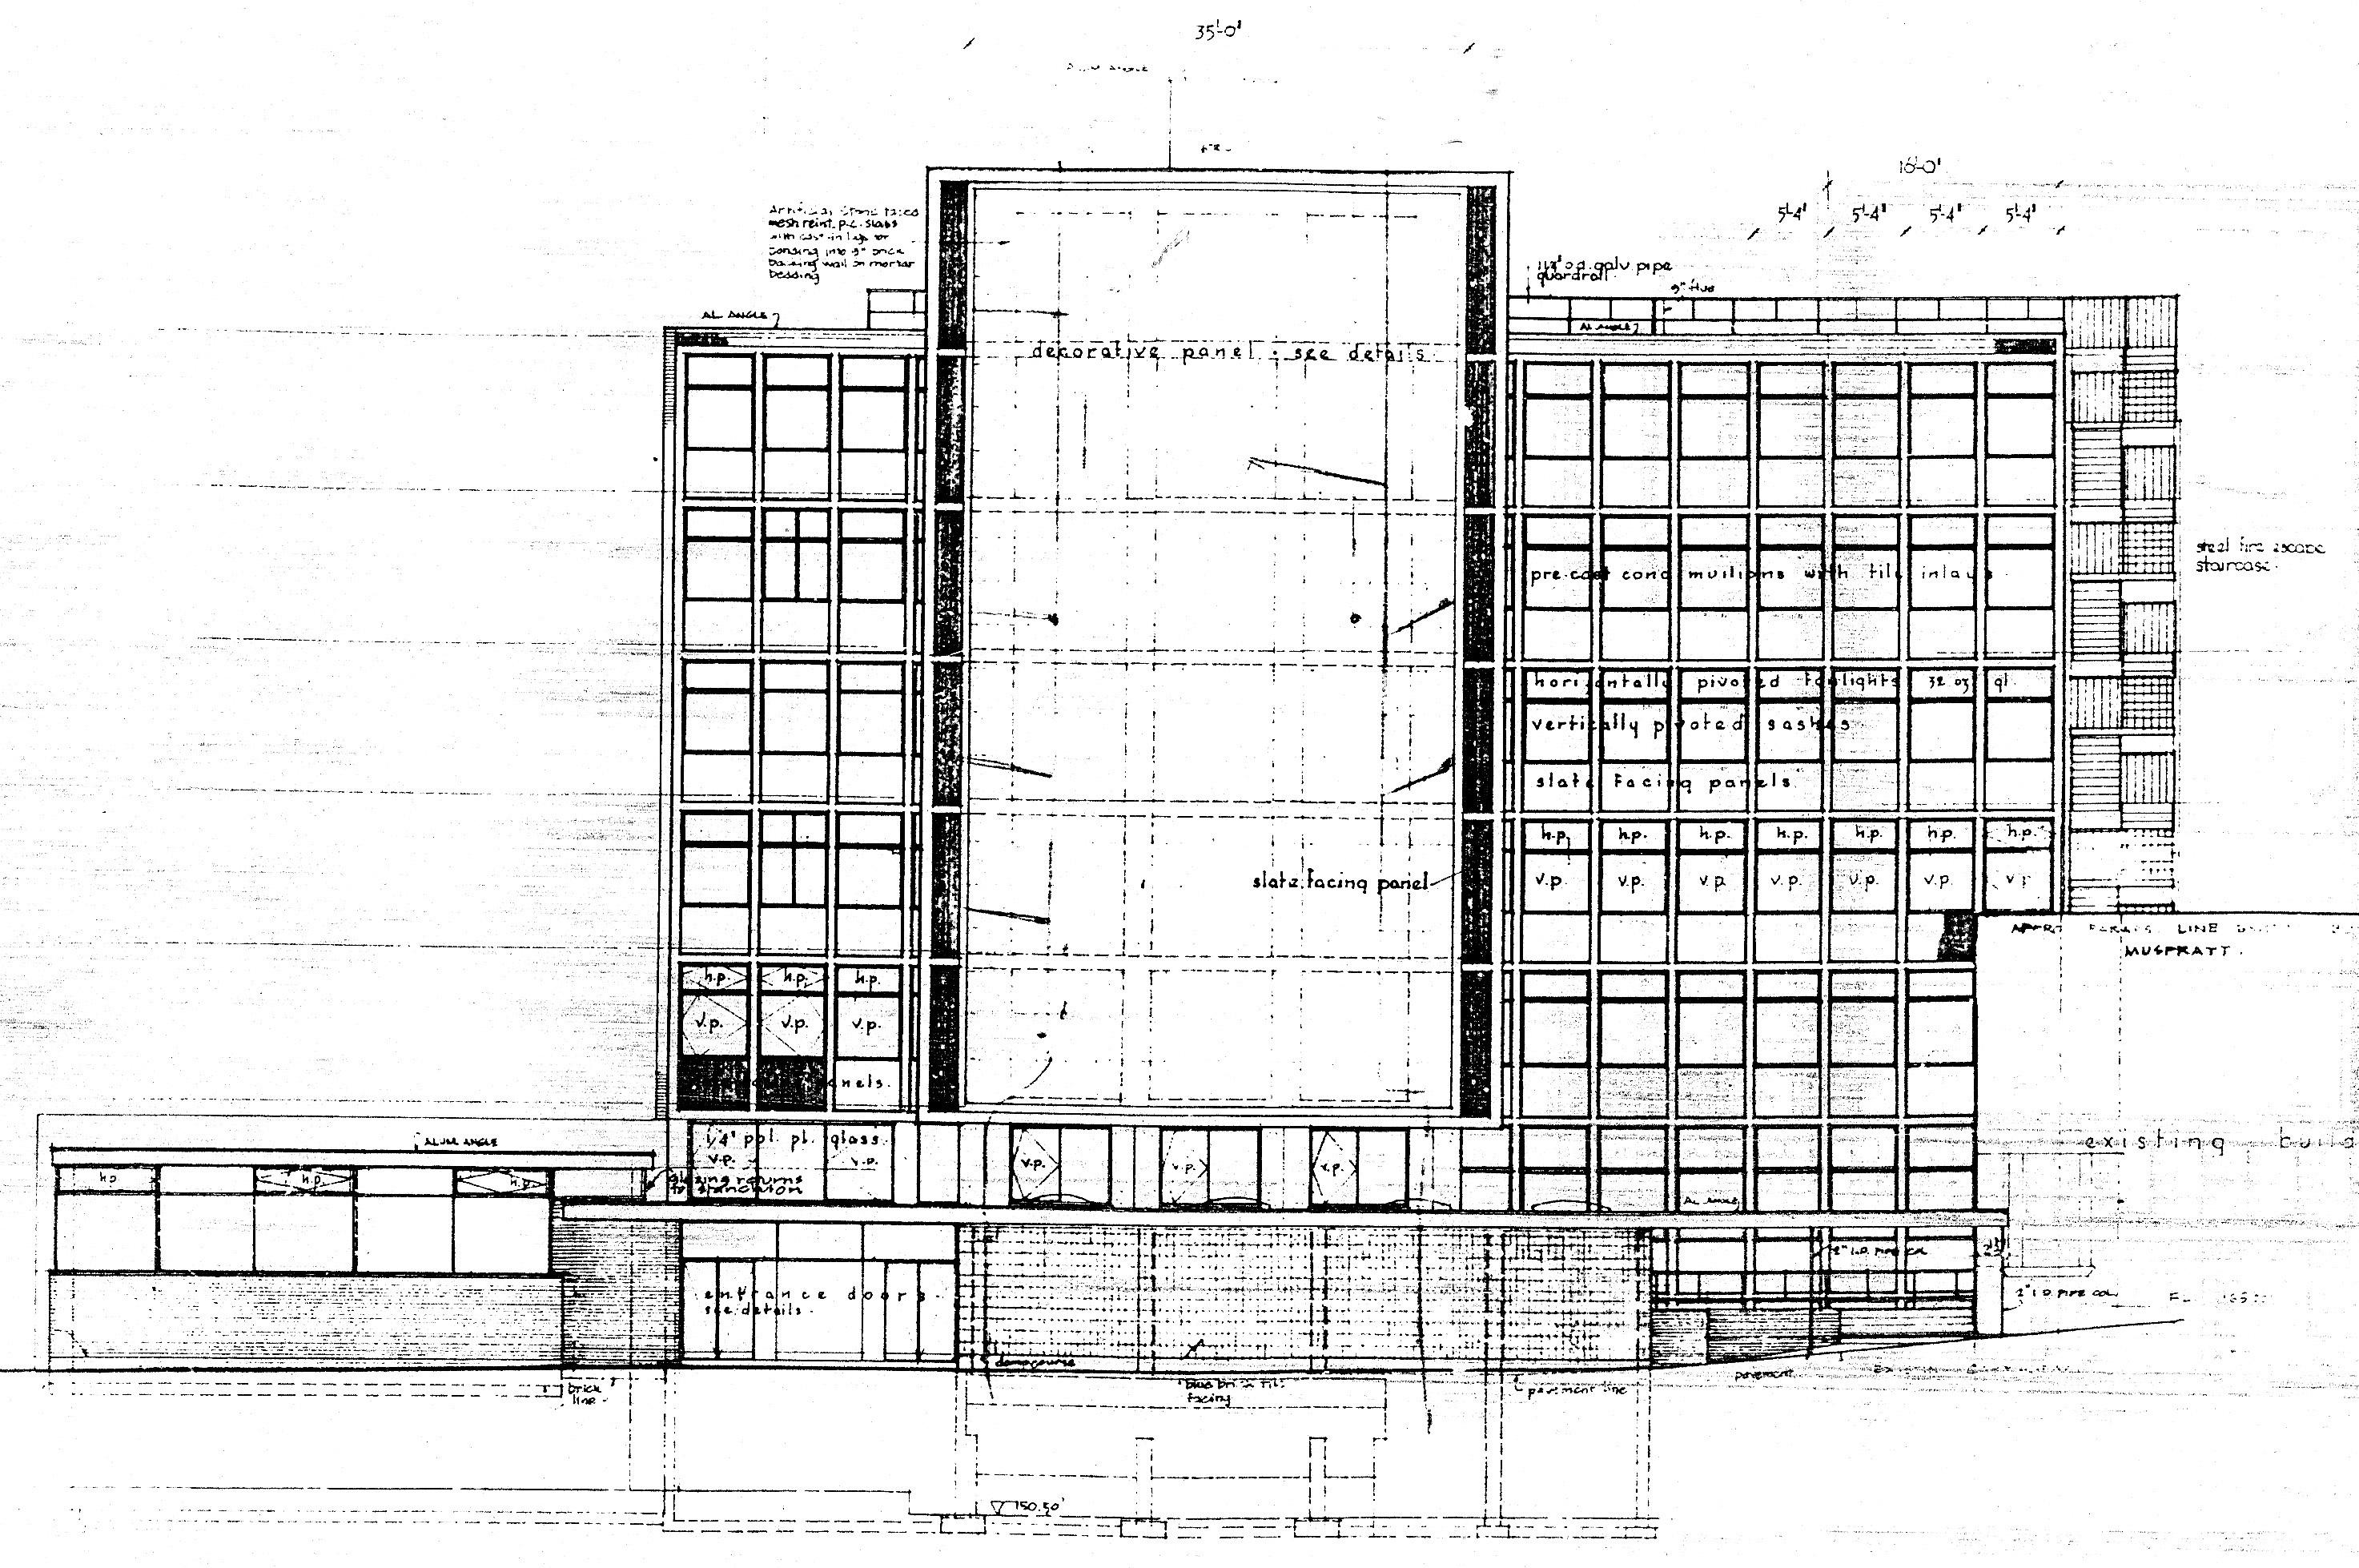 Building, Civil engineering and Engineering on Pinterest